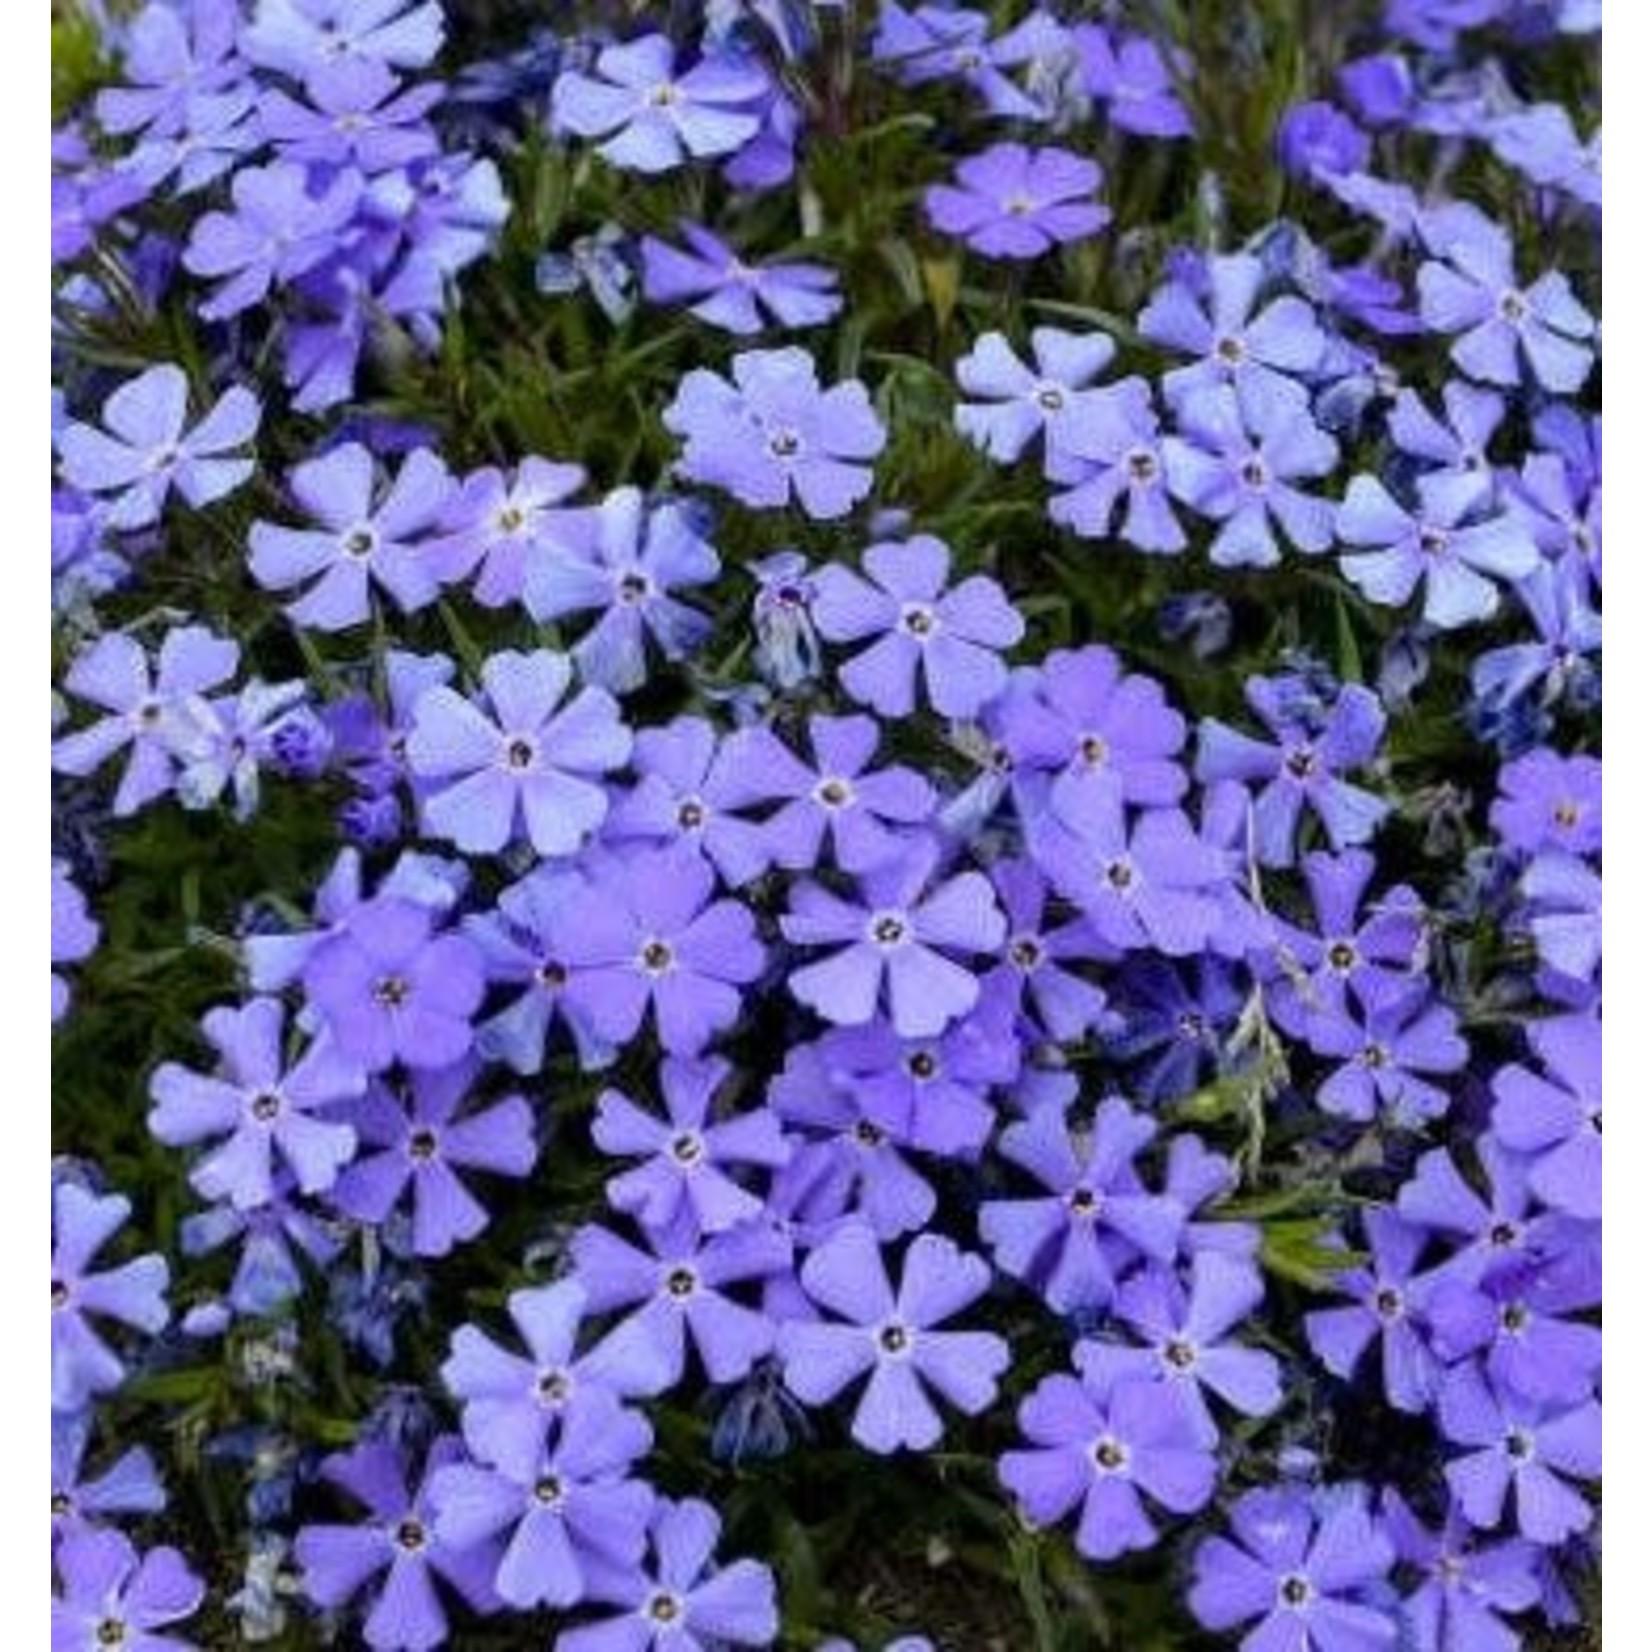 Creeping Phlox - Rocky Road Violet Blue - 1 gal